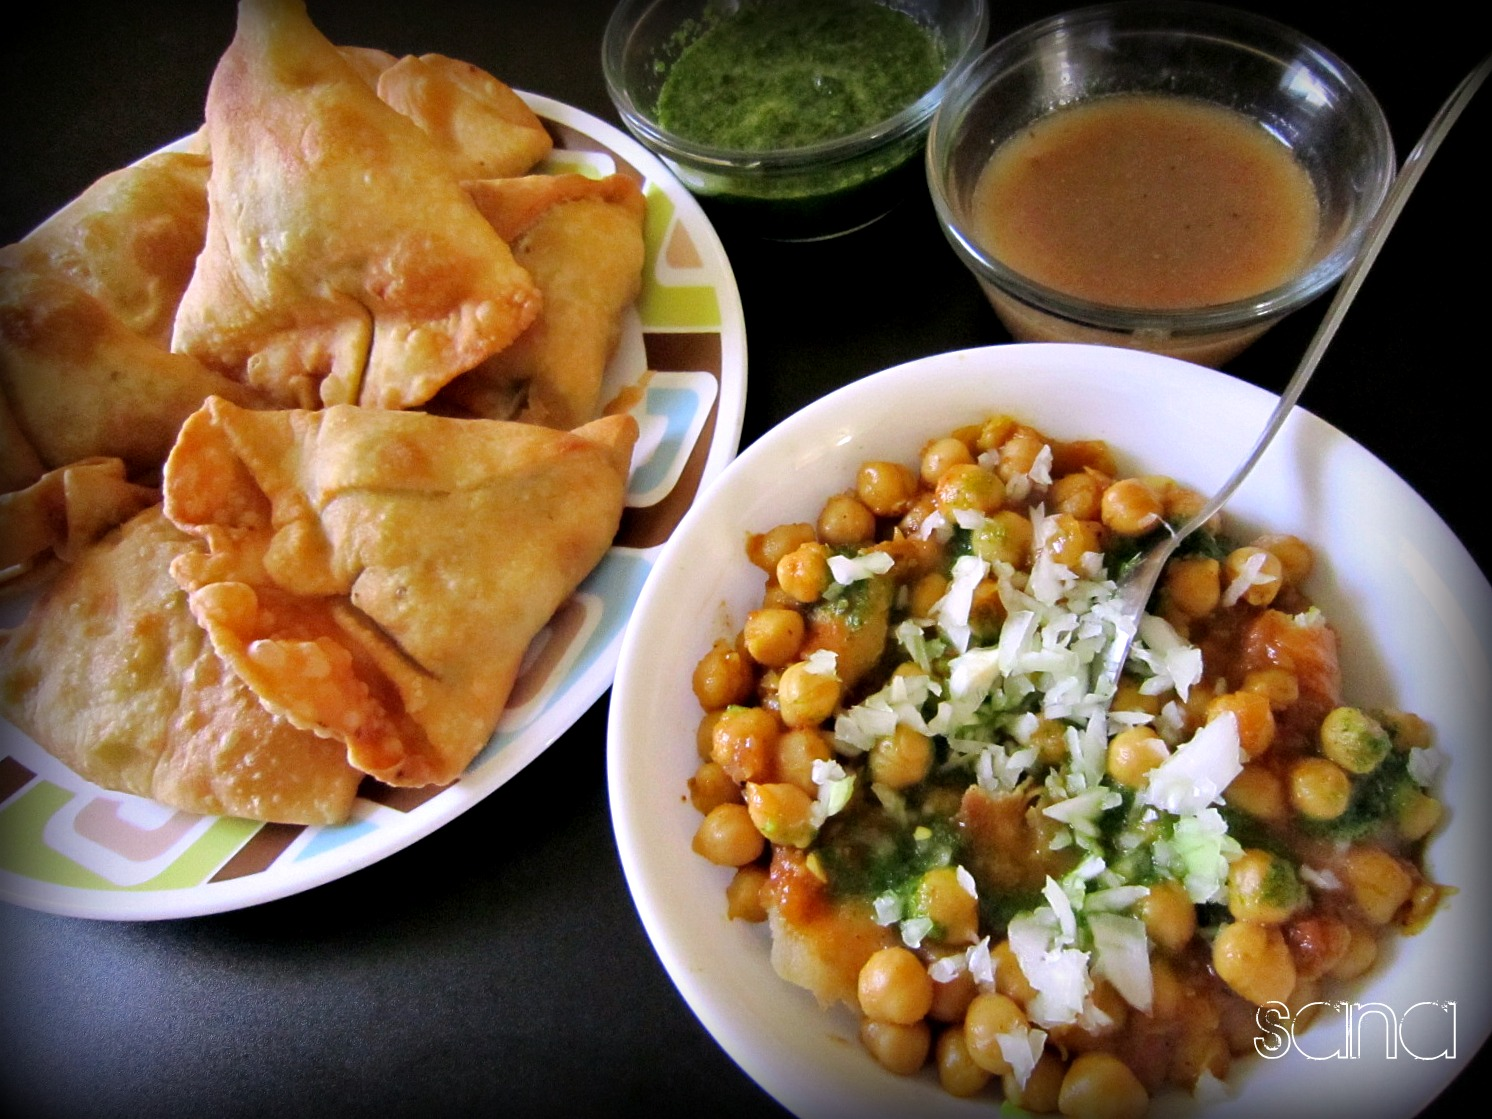 ragda samosa a blogful of food